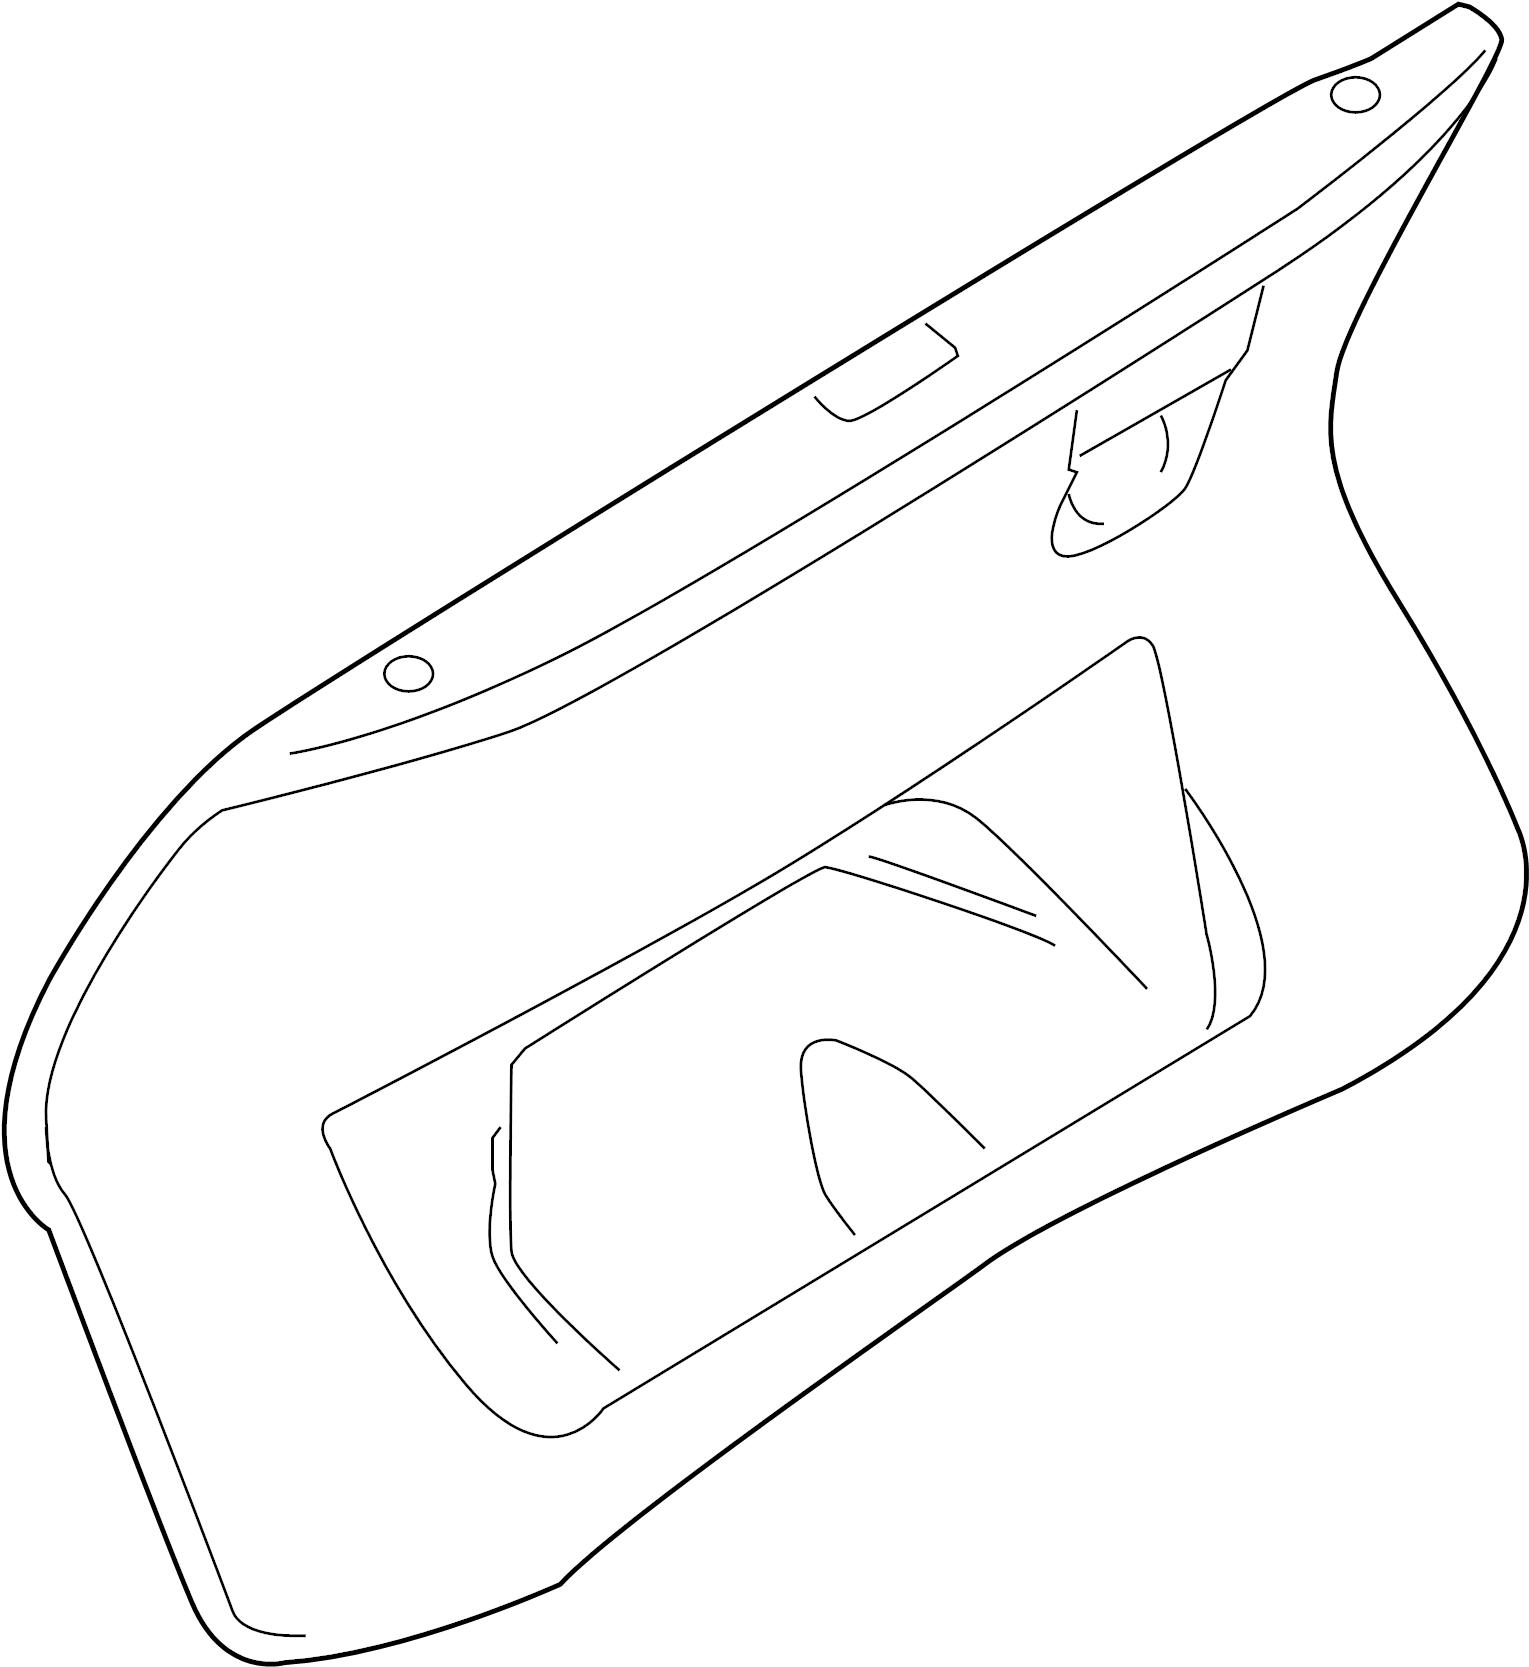 2006 Audi A6 Trim Panel For Hatch Gate